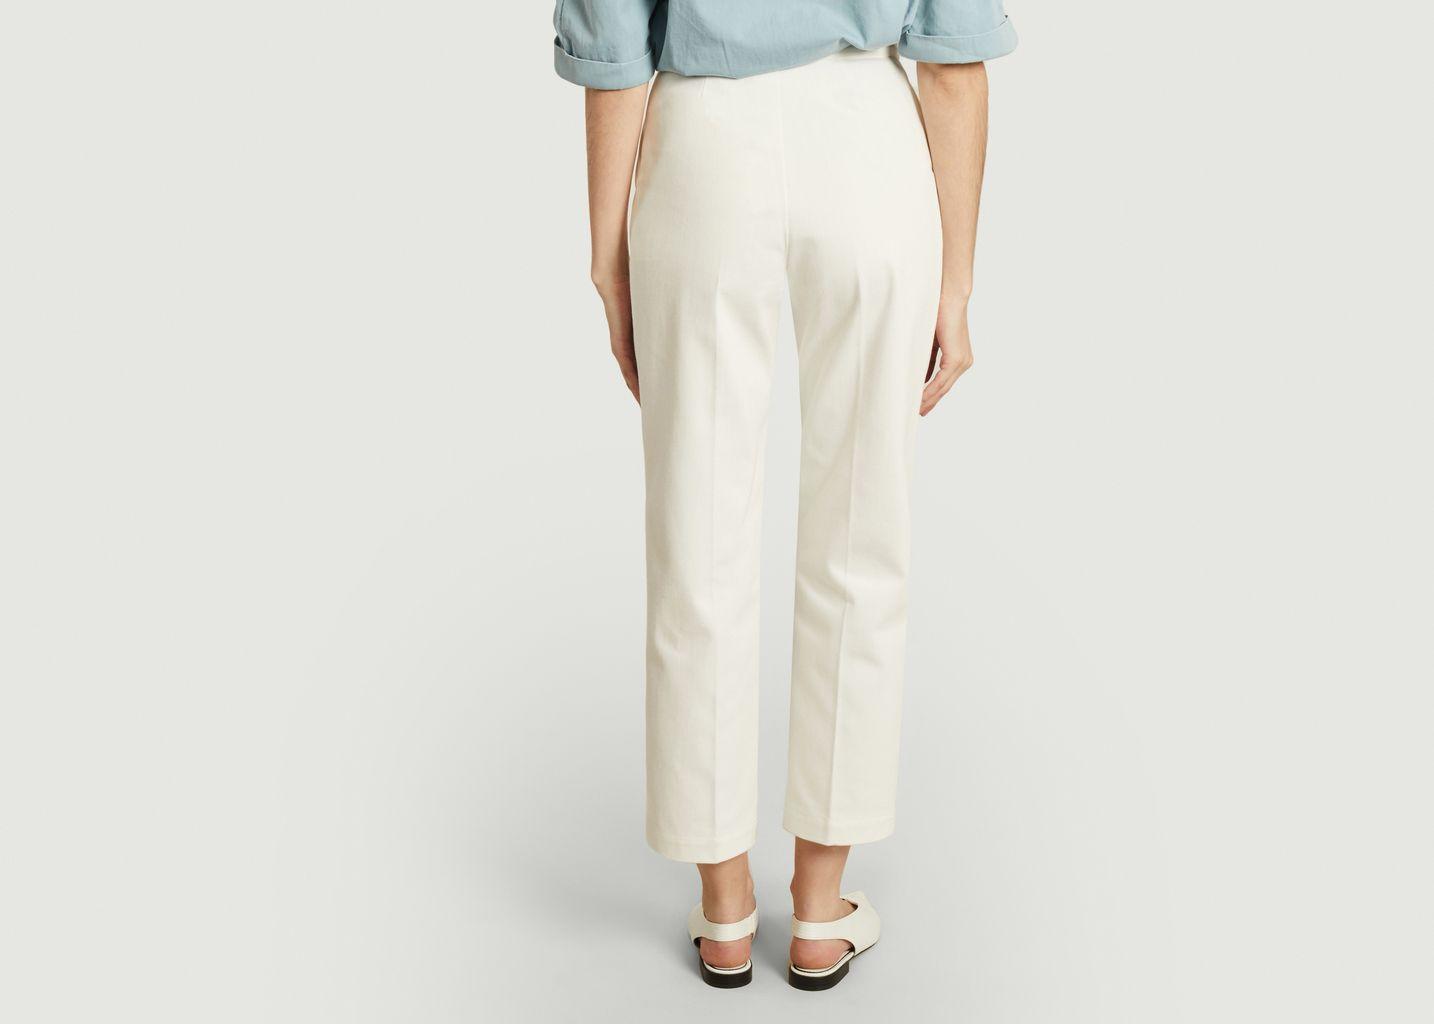 Pantalon en denim taille haute Patti - Façon Jacmin